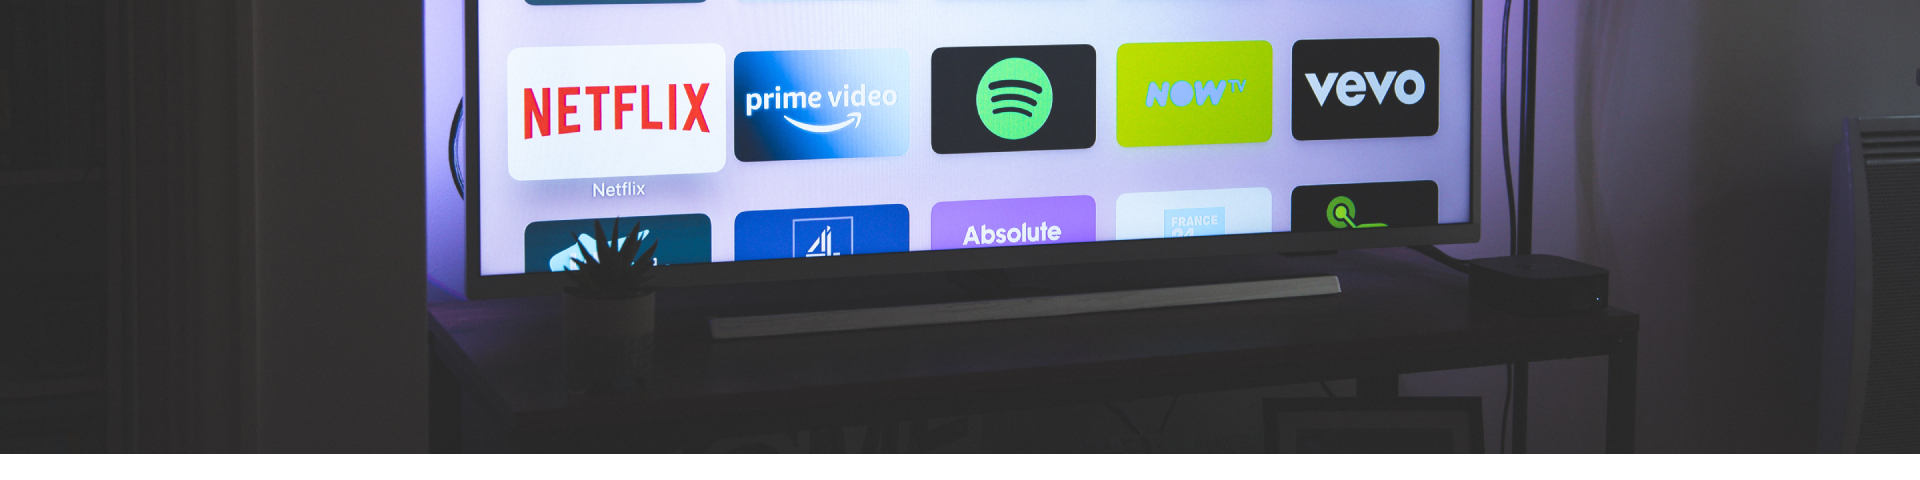 Digital TV development Promwad